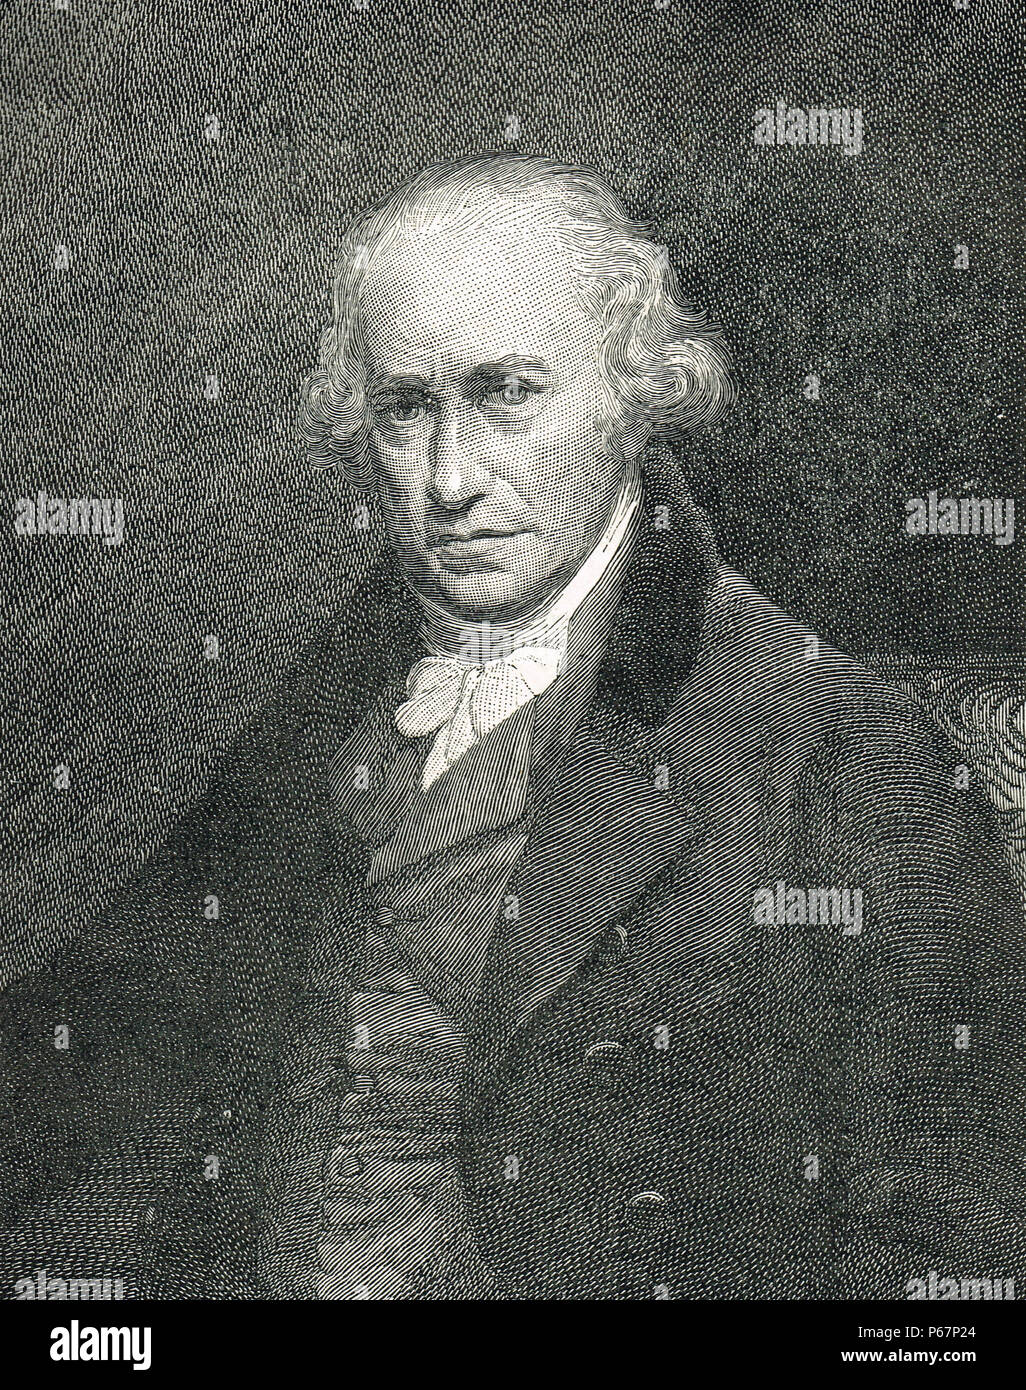 James Watt, Scottish inventor, mechanical engineer, and chemist - Stock Image